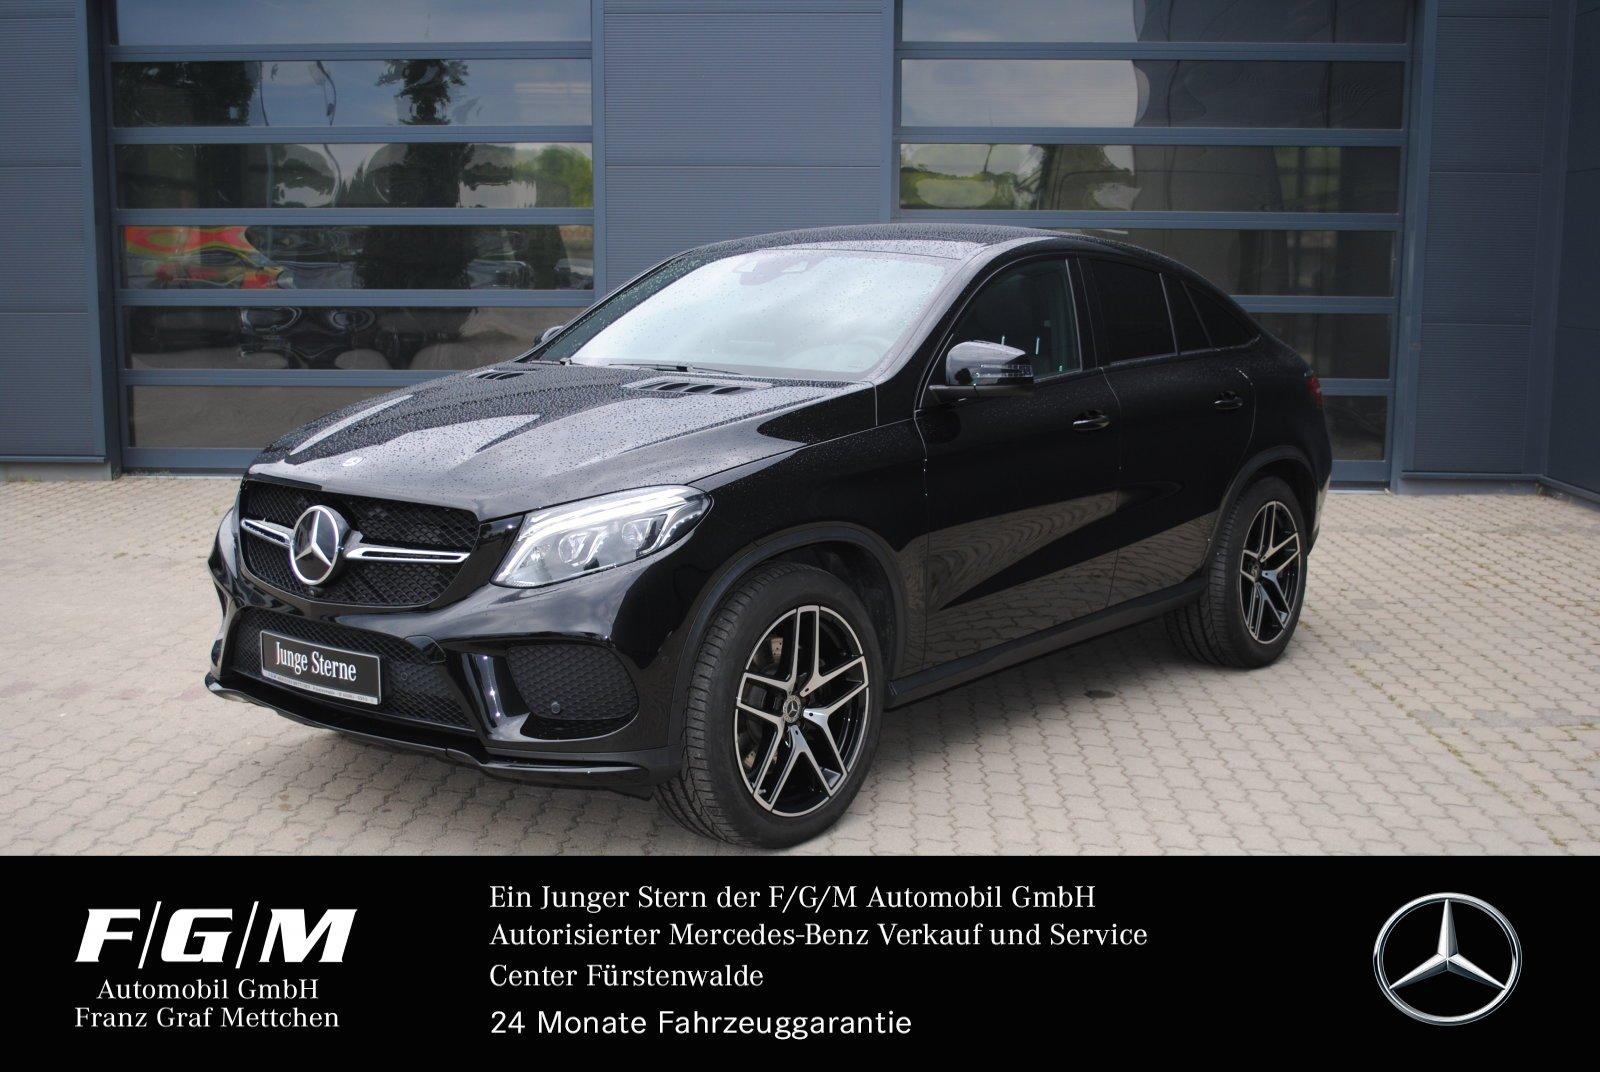 Mercedes-Benz GLE 500 4M AMG/COM/Pano/Distr/360/TV/Mem/Airmati, Jahr 2017, Benzin